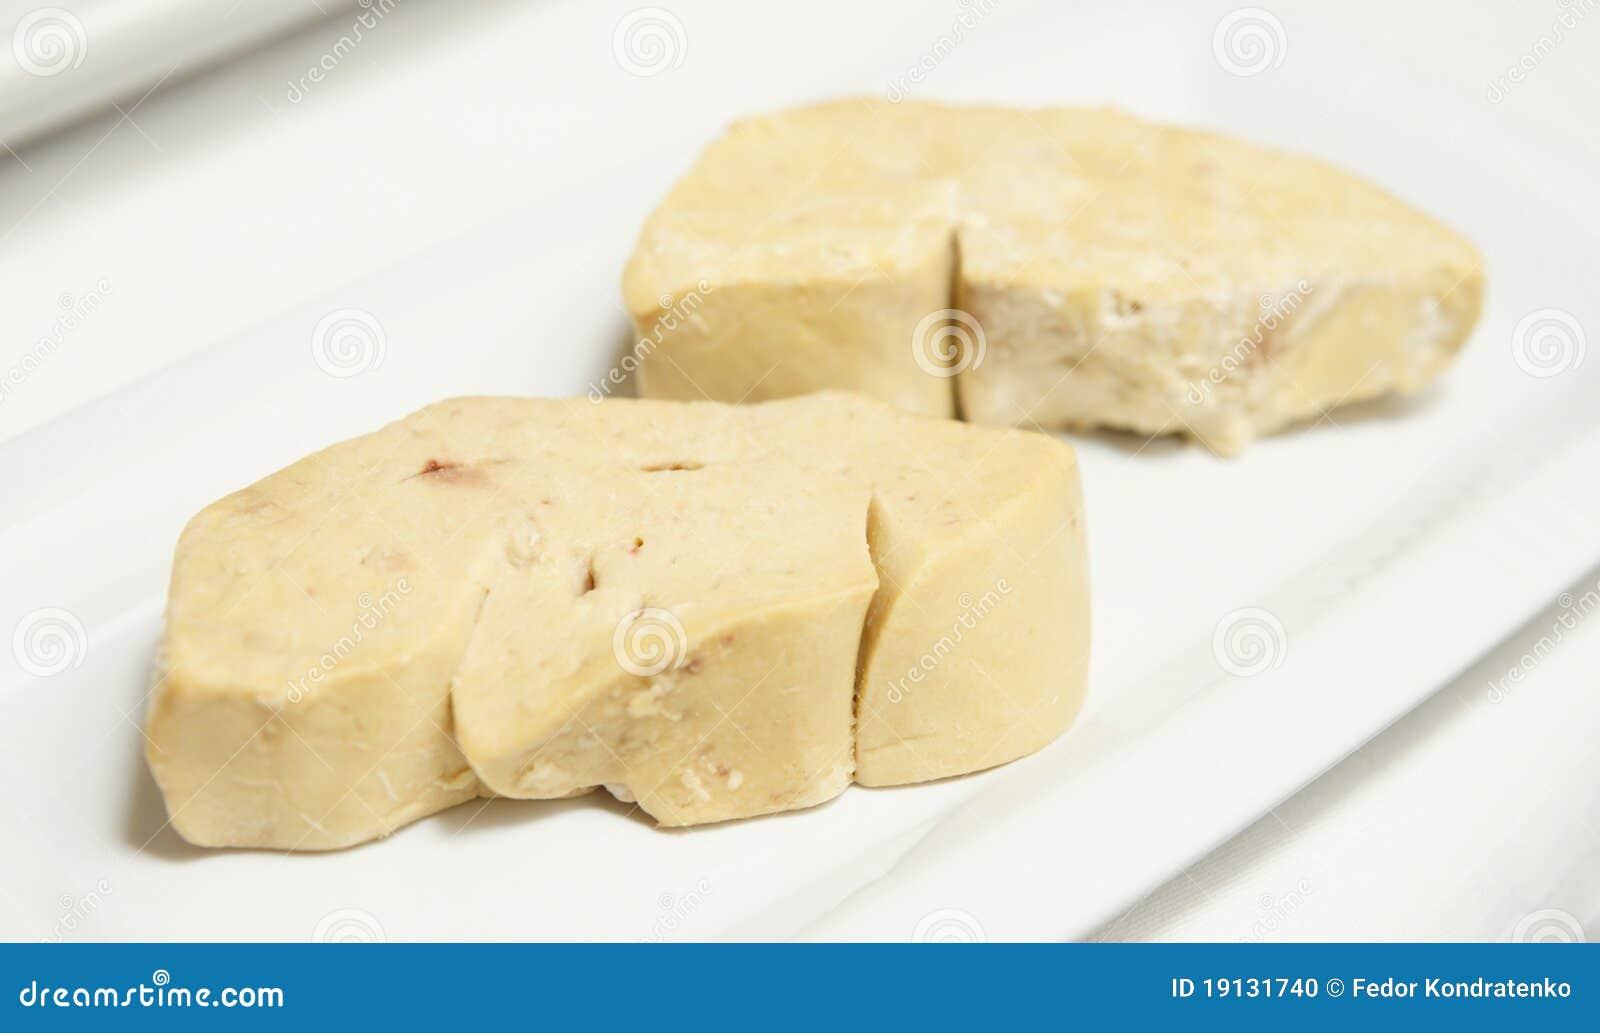 Two pieces of duck foie gras